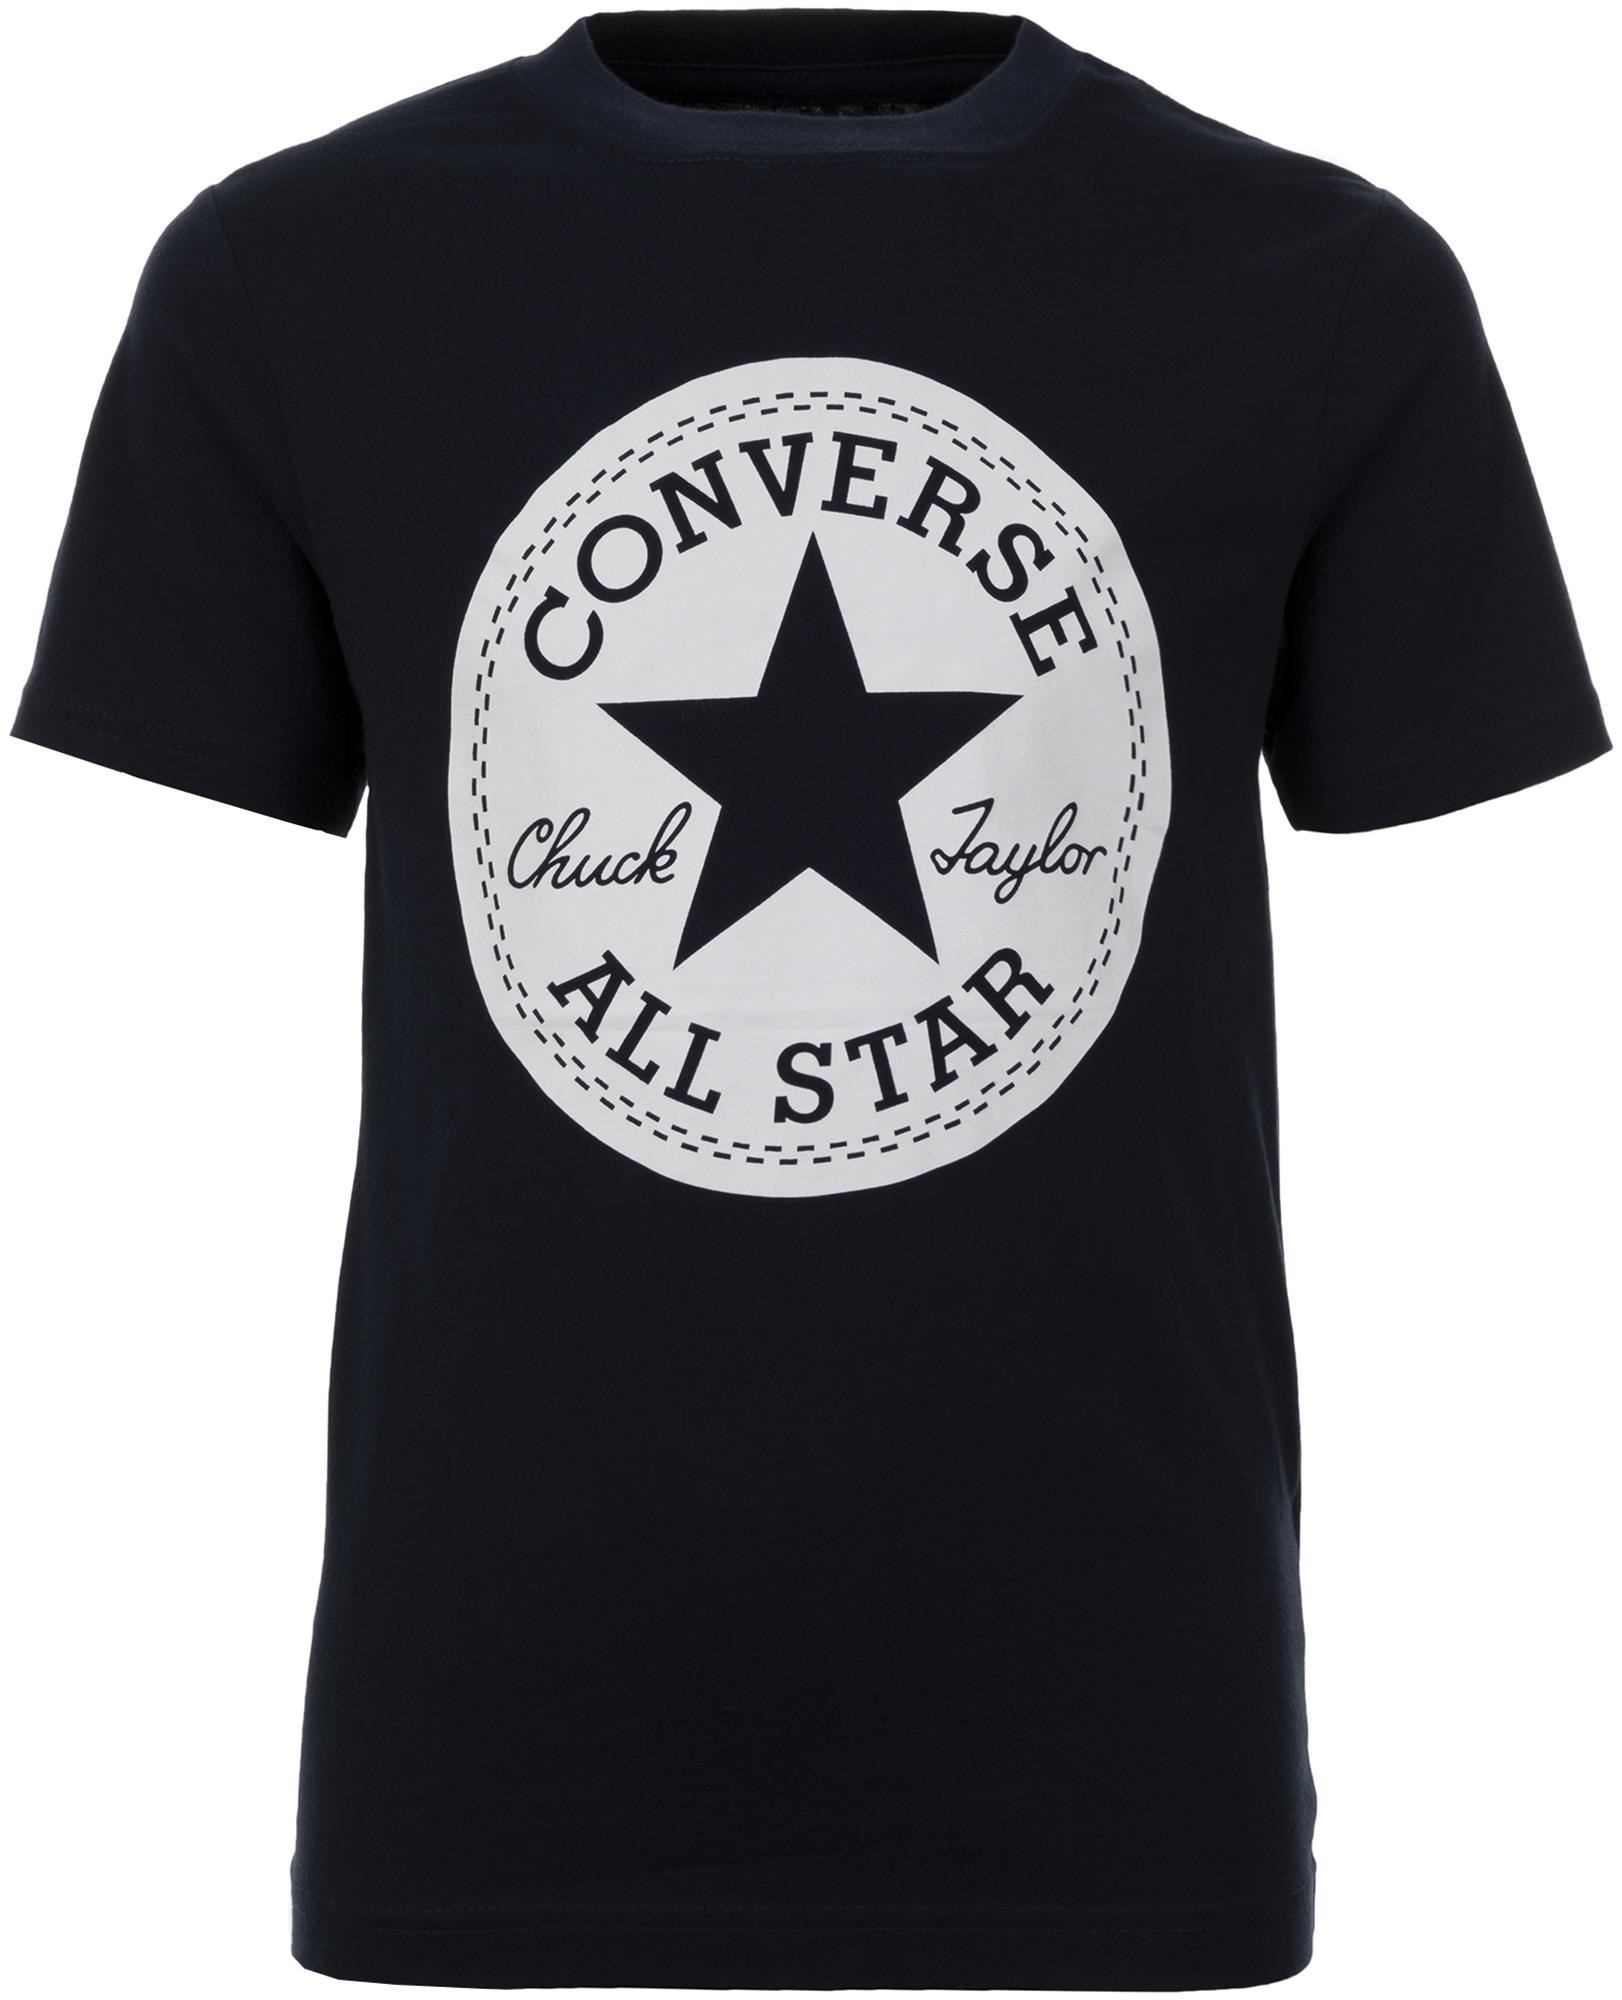 Converse Футболка для мальчиков Converse, размер 140